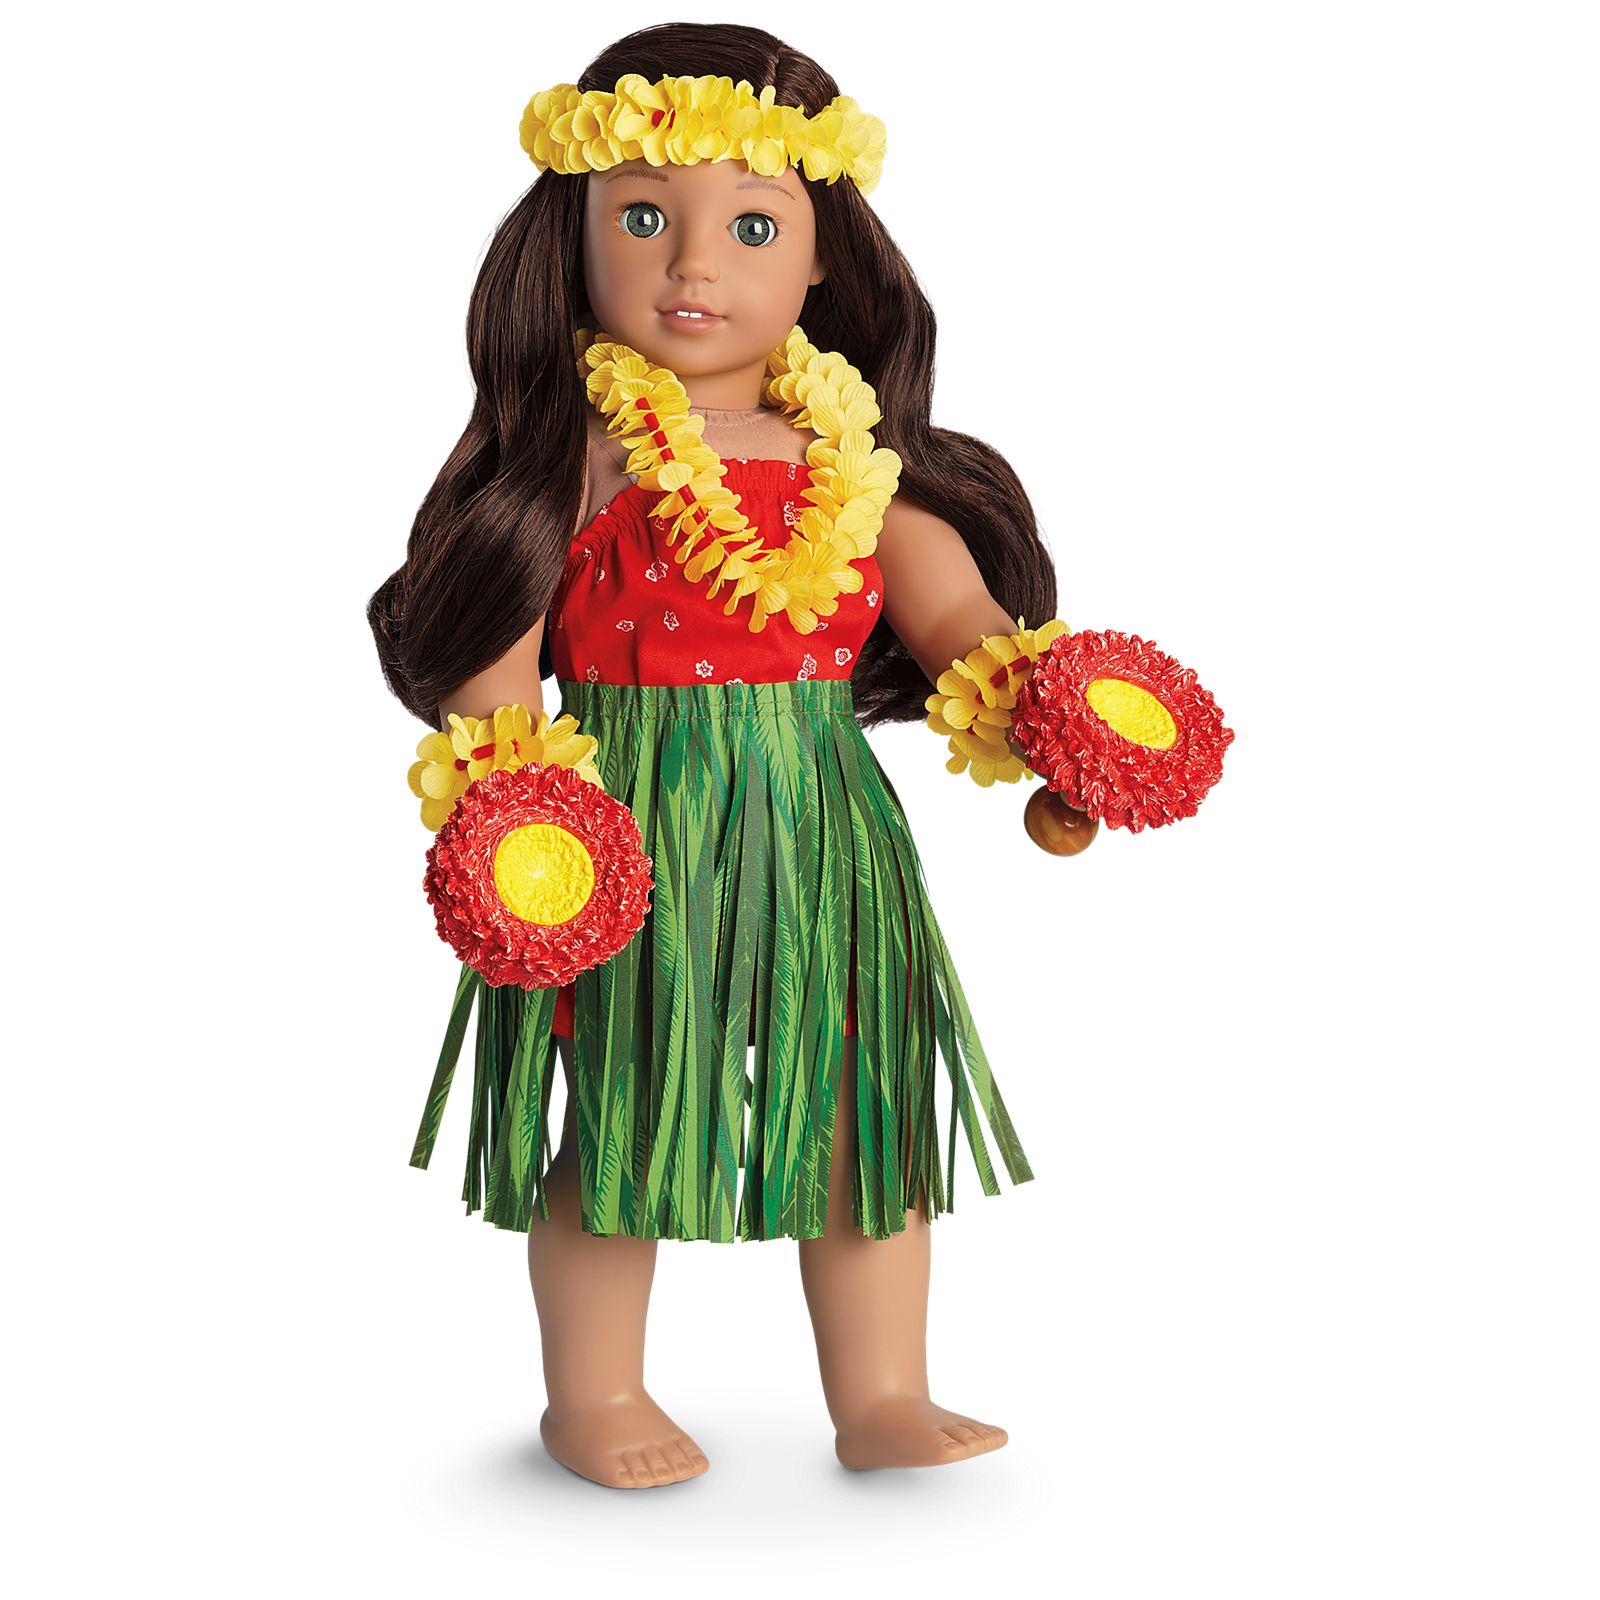 Nanea's Hula Outfit